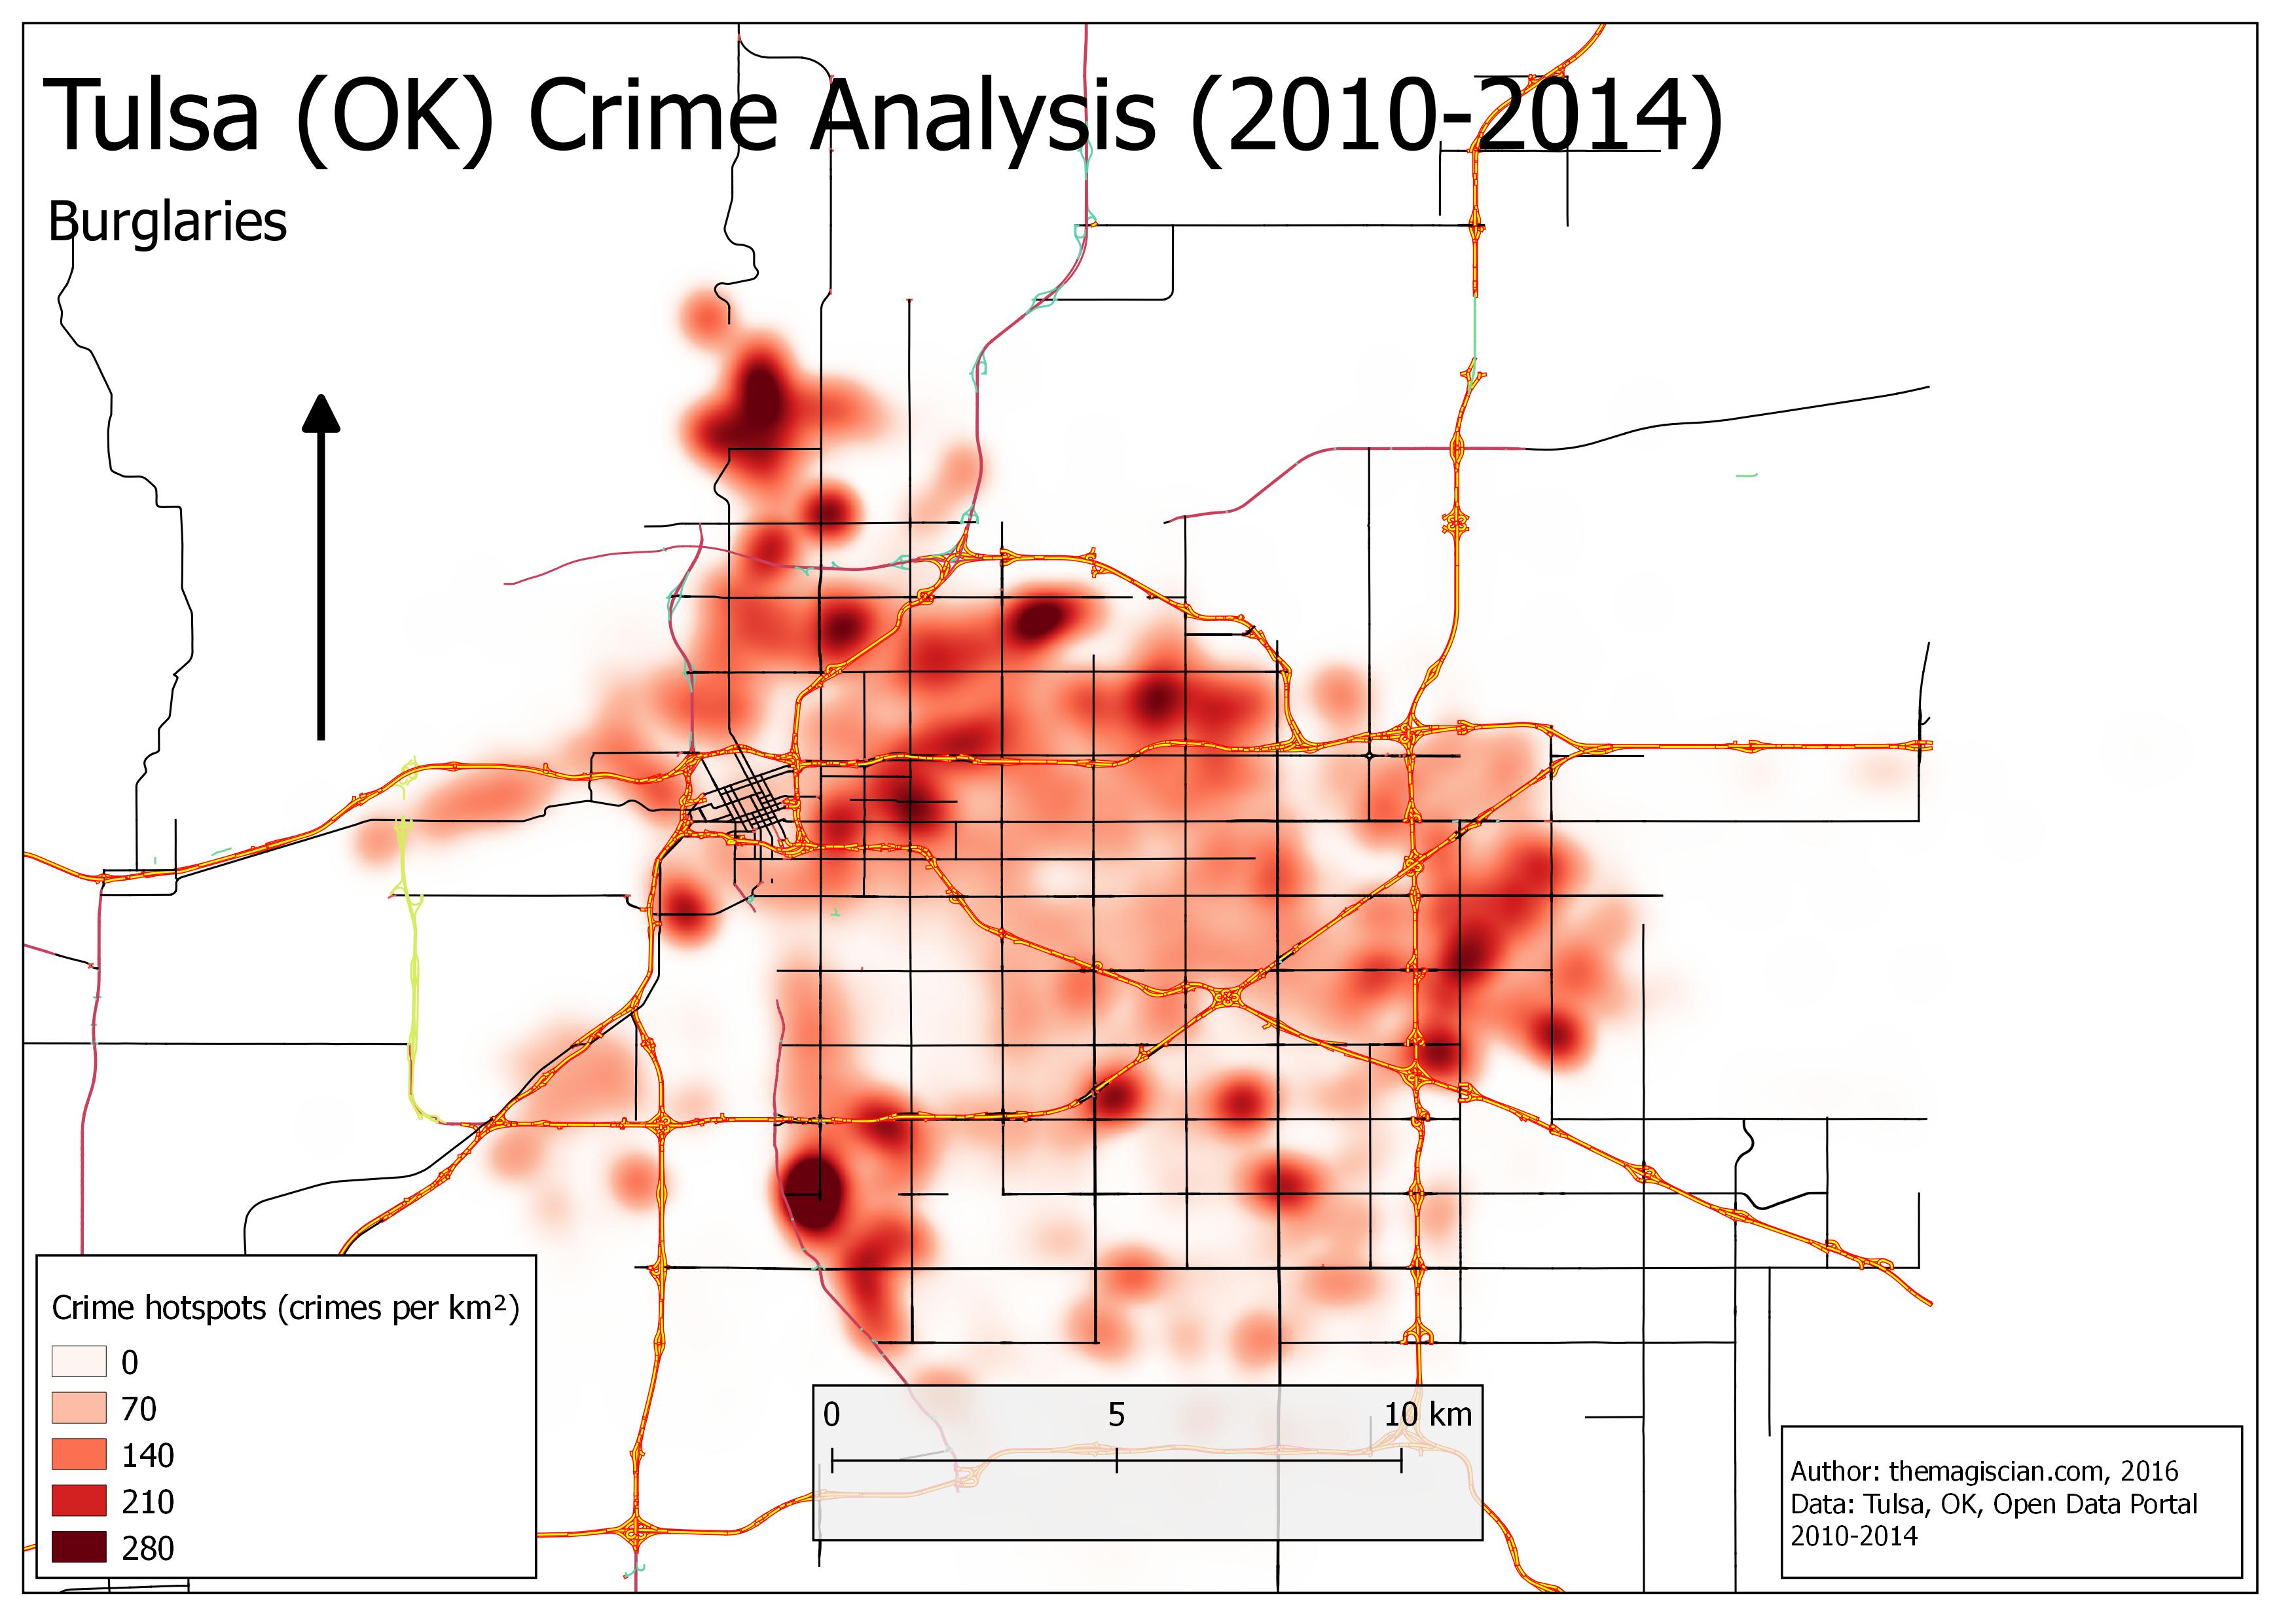 Burglaries Hotspots (2010-2014)